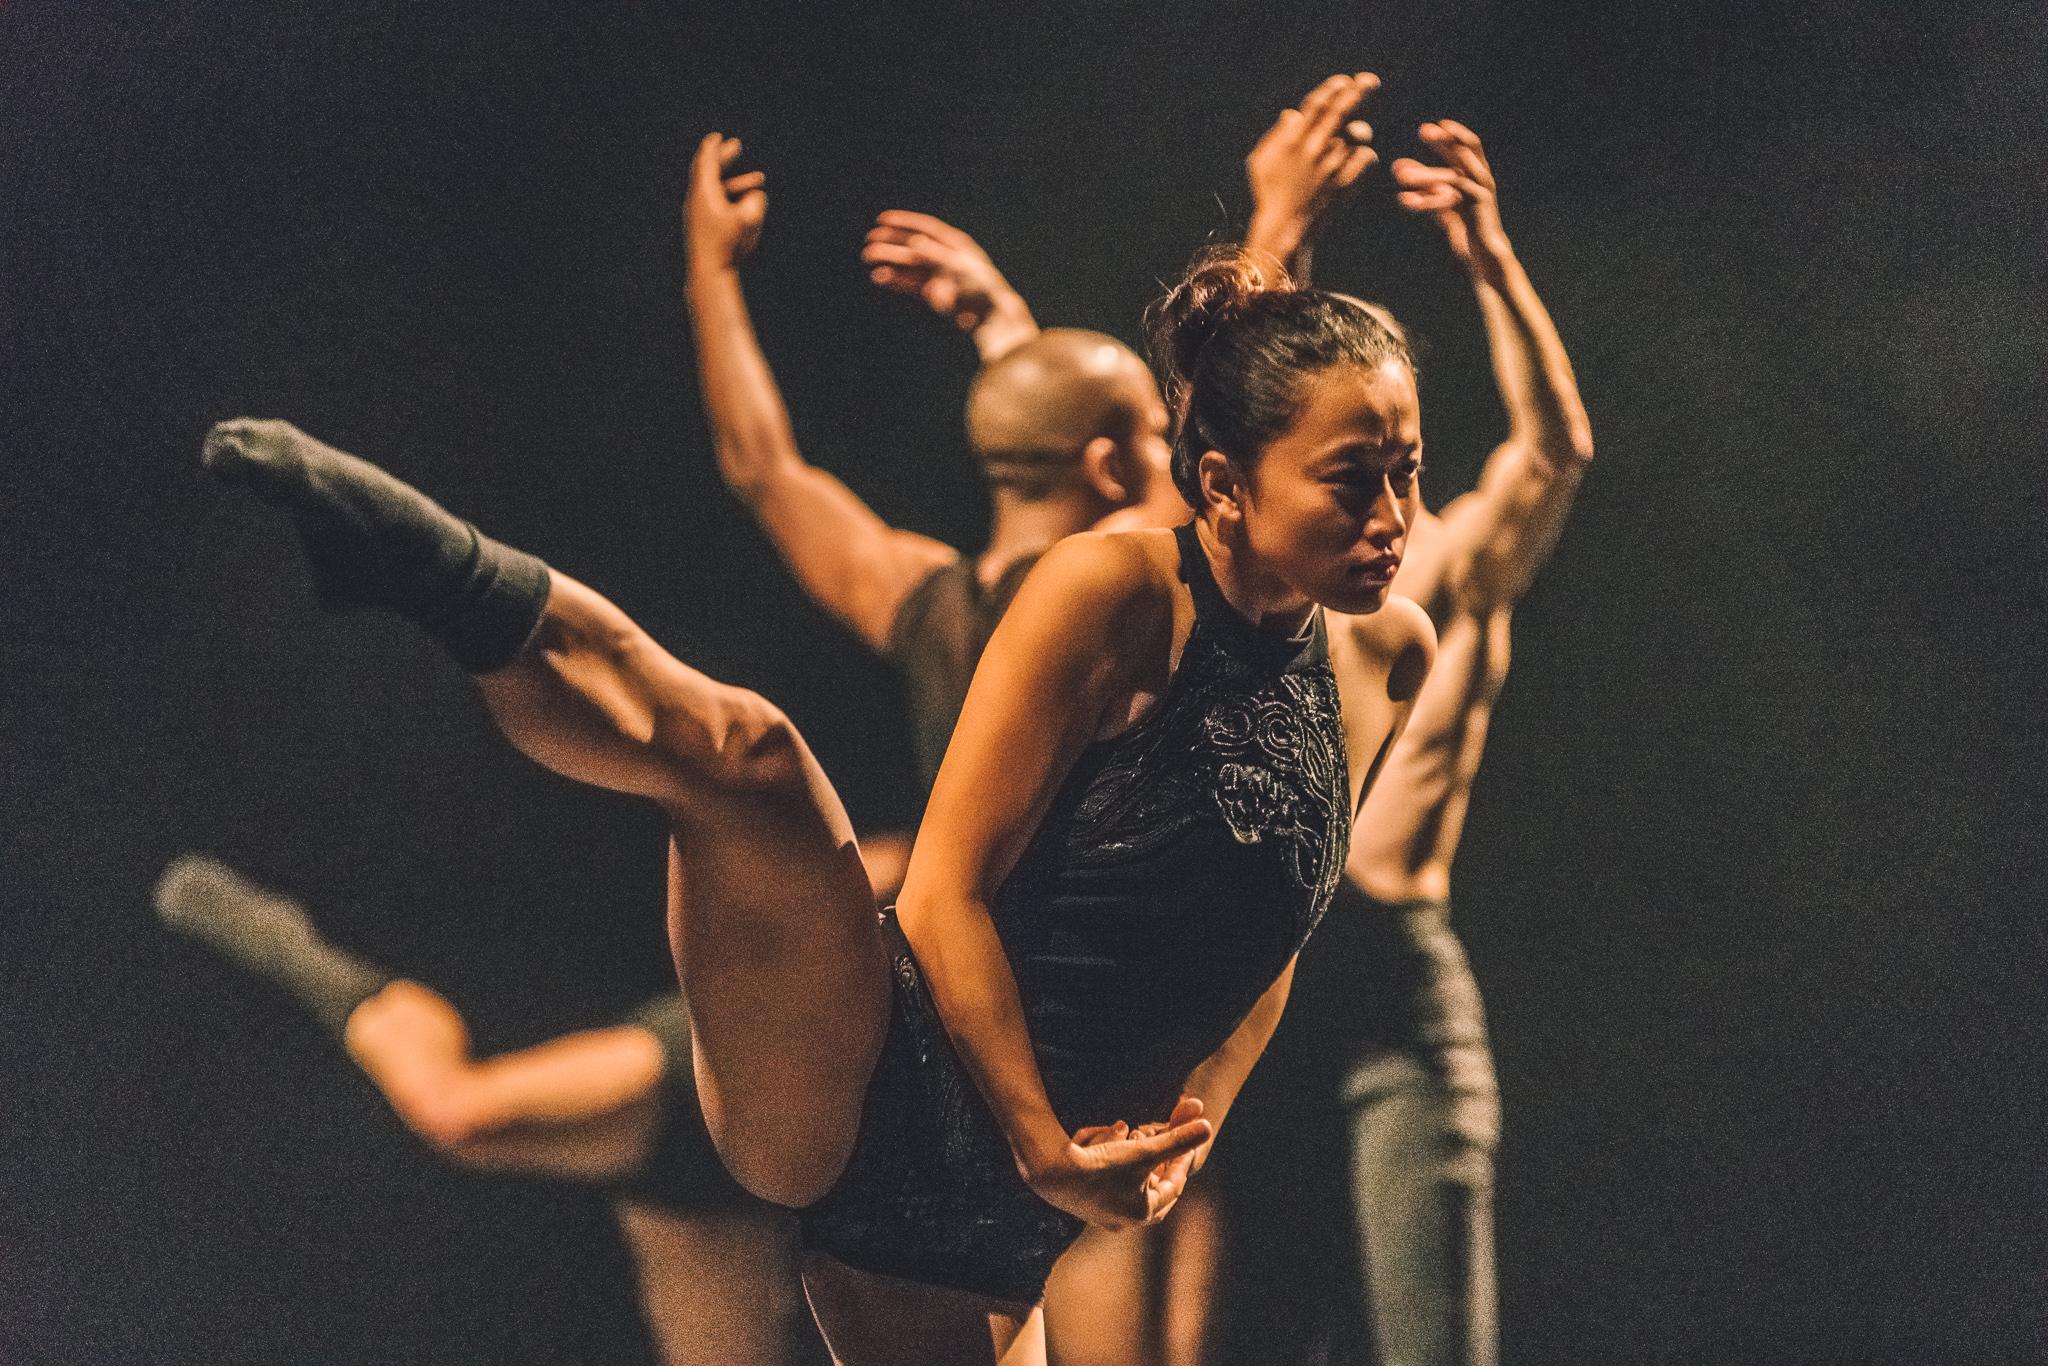 LEV Dance Company - SHARON EYAL | GAI BEHAR dance photography, fotografia de escena, fotografo de danza, dance photographer, stage photography